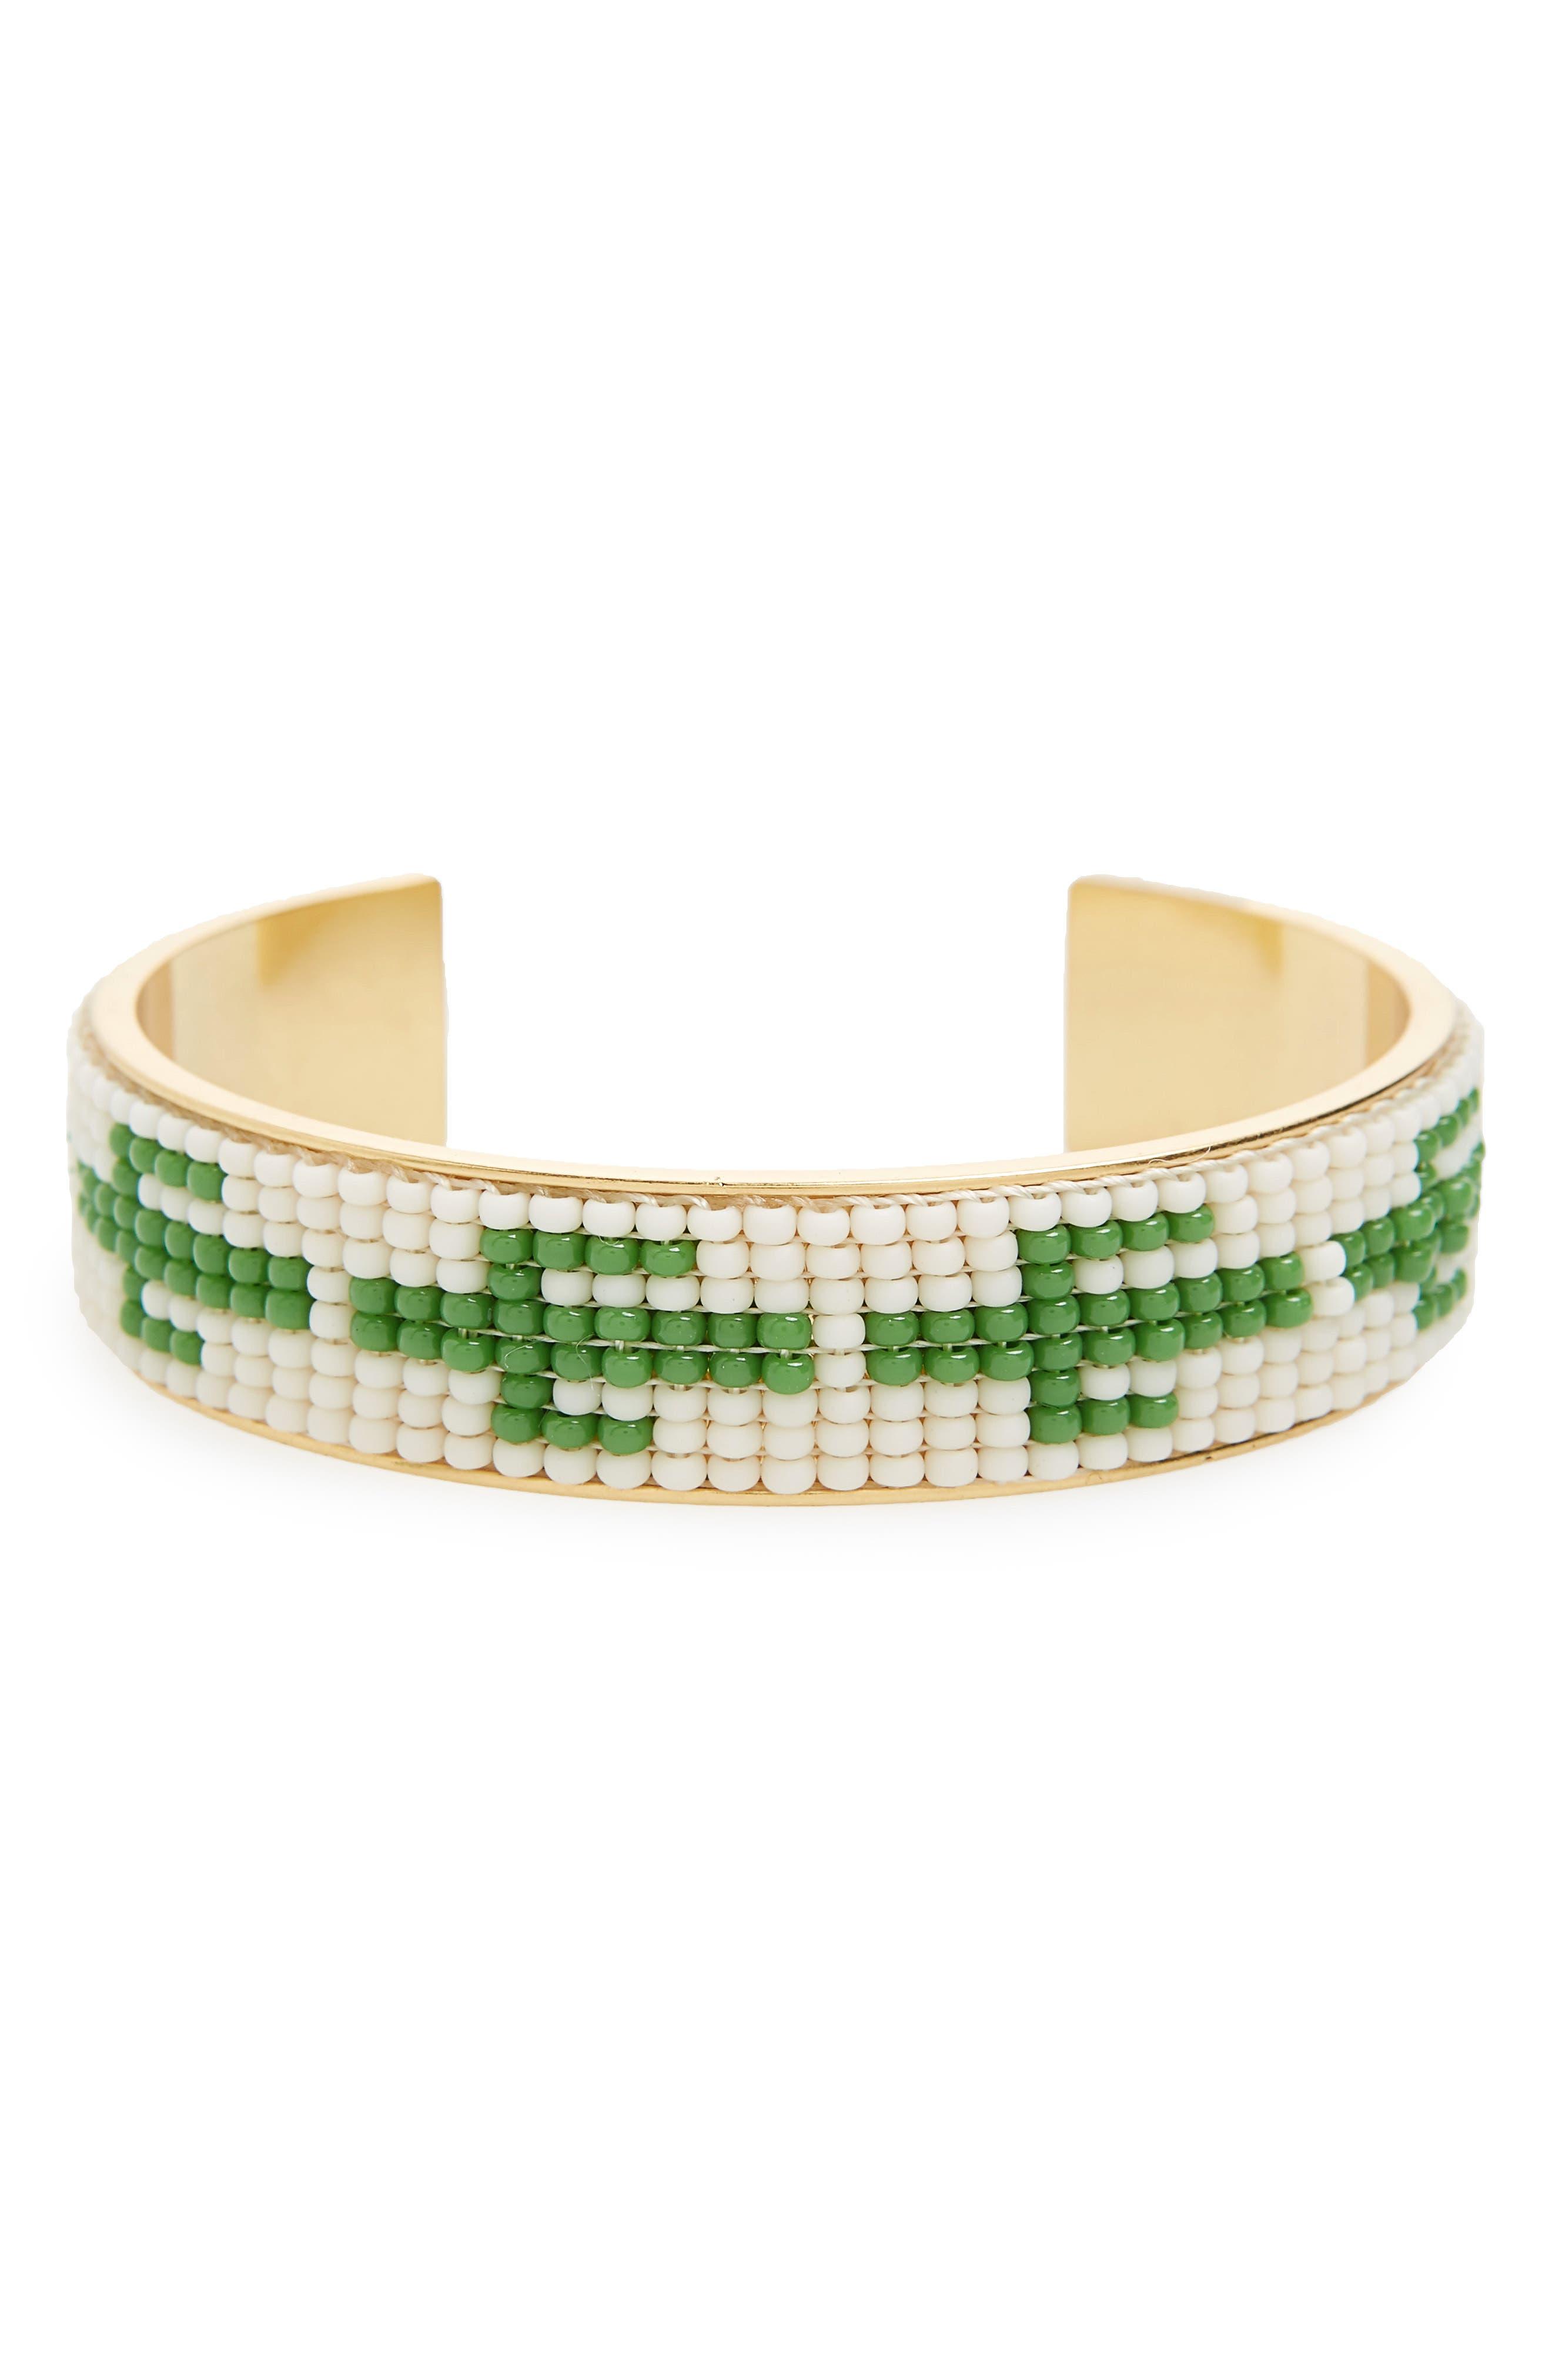 Beaded Cuff Bracelet,                         Main,                         color, Cactus Green